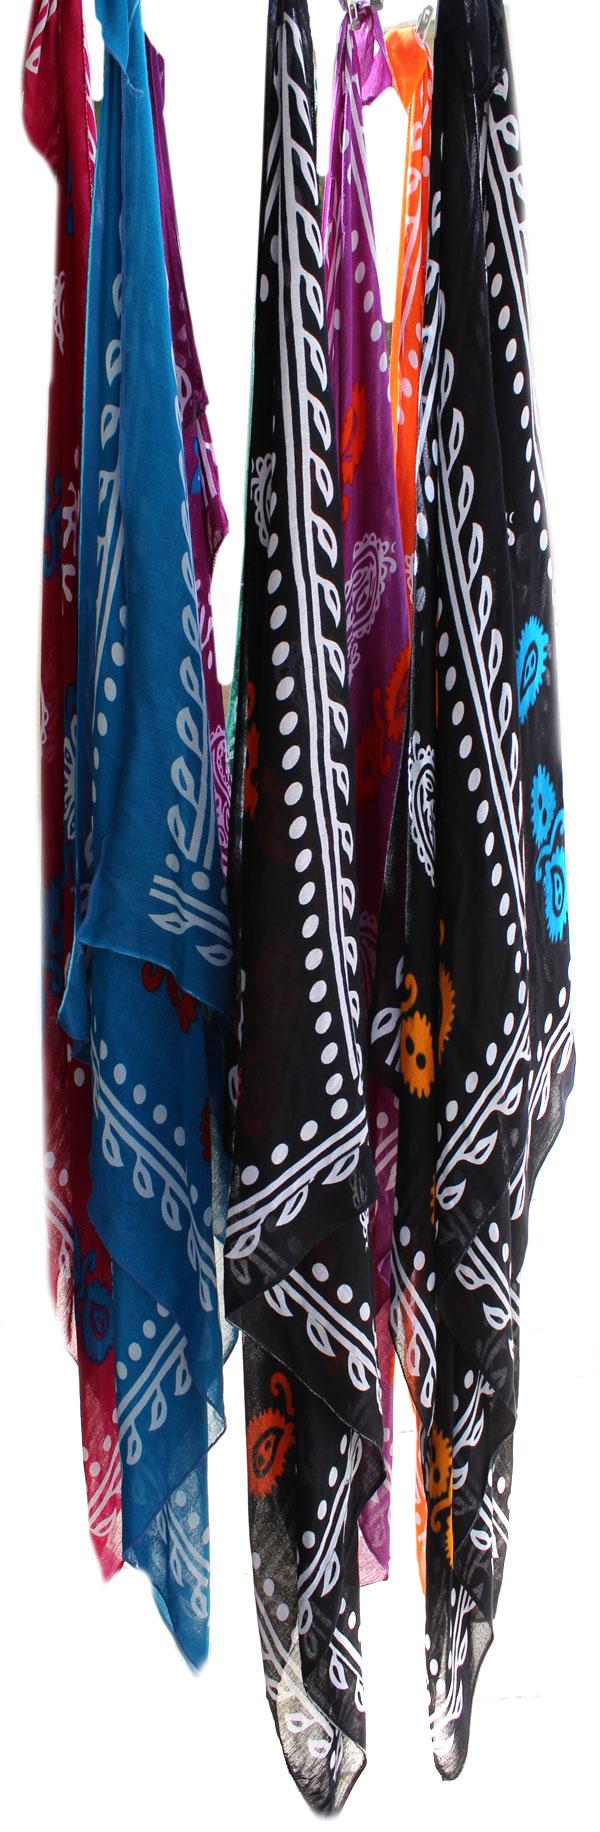 روسری گُل وَنی